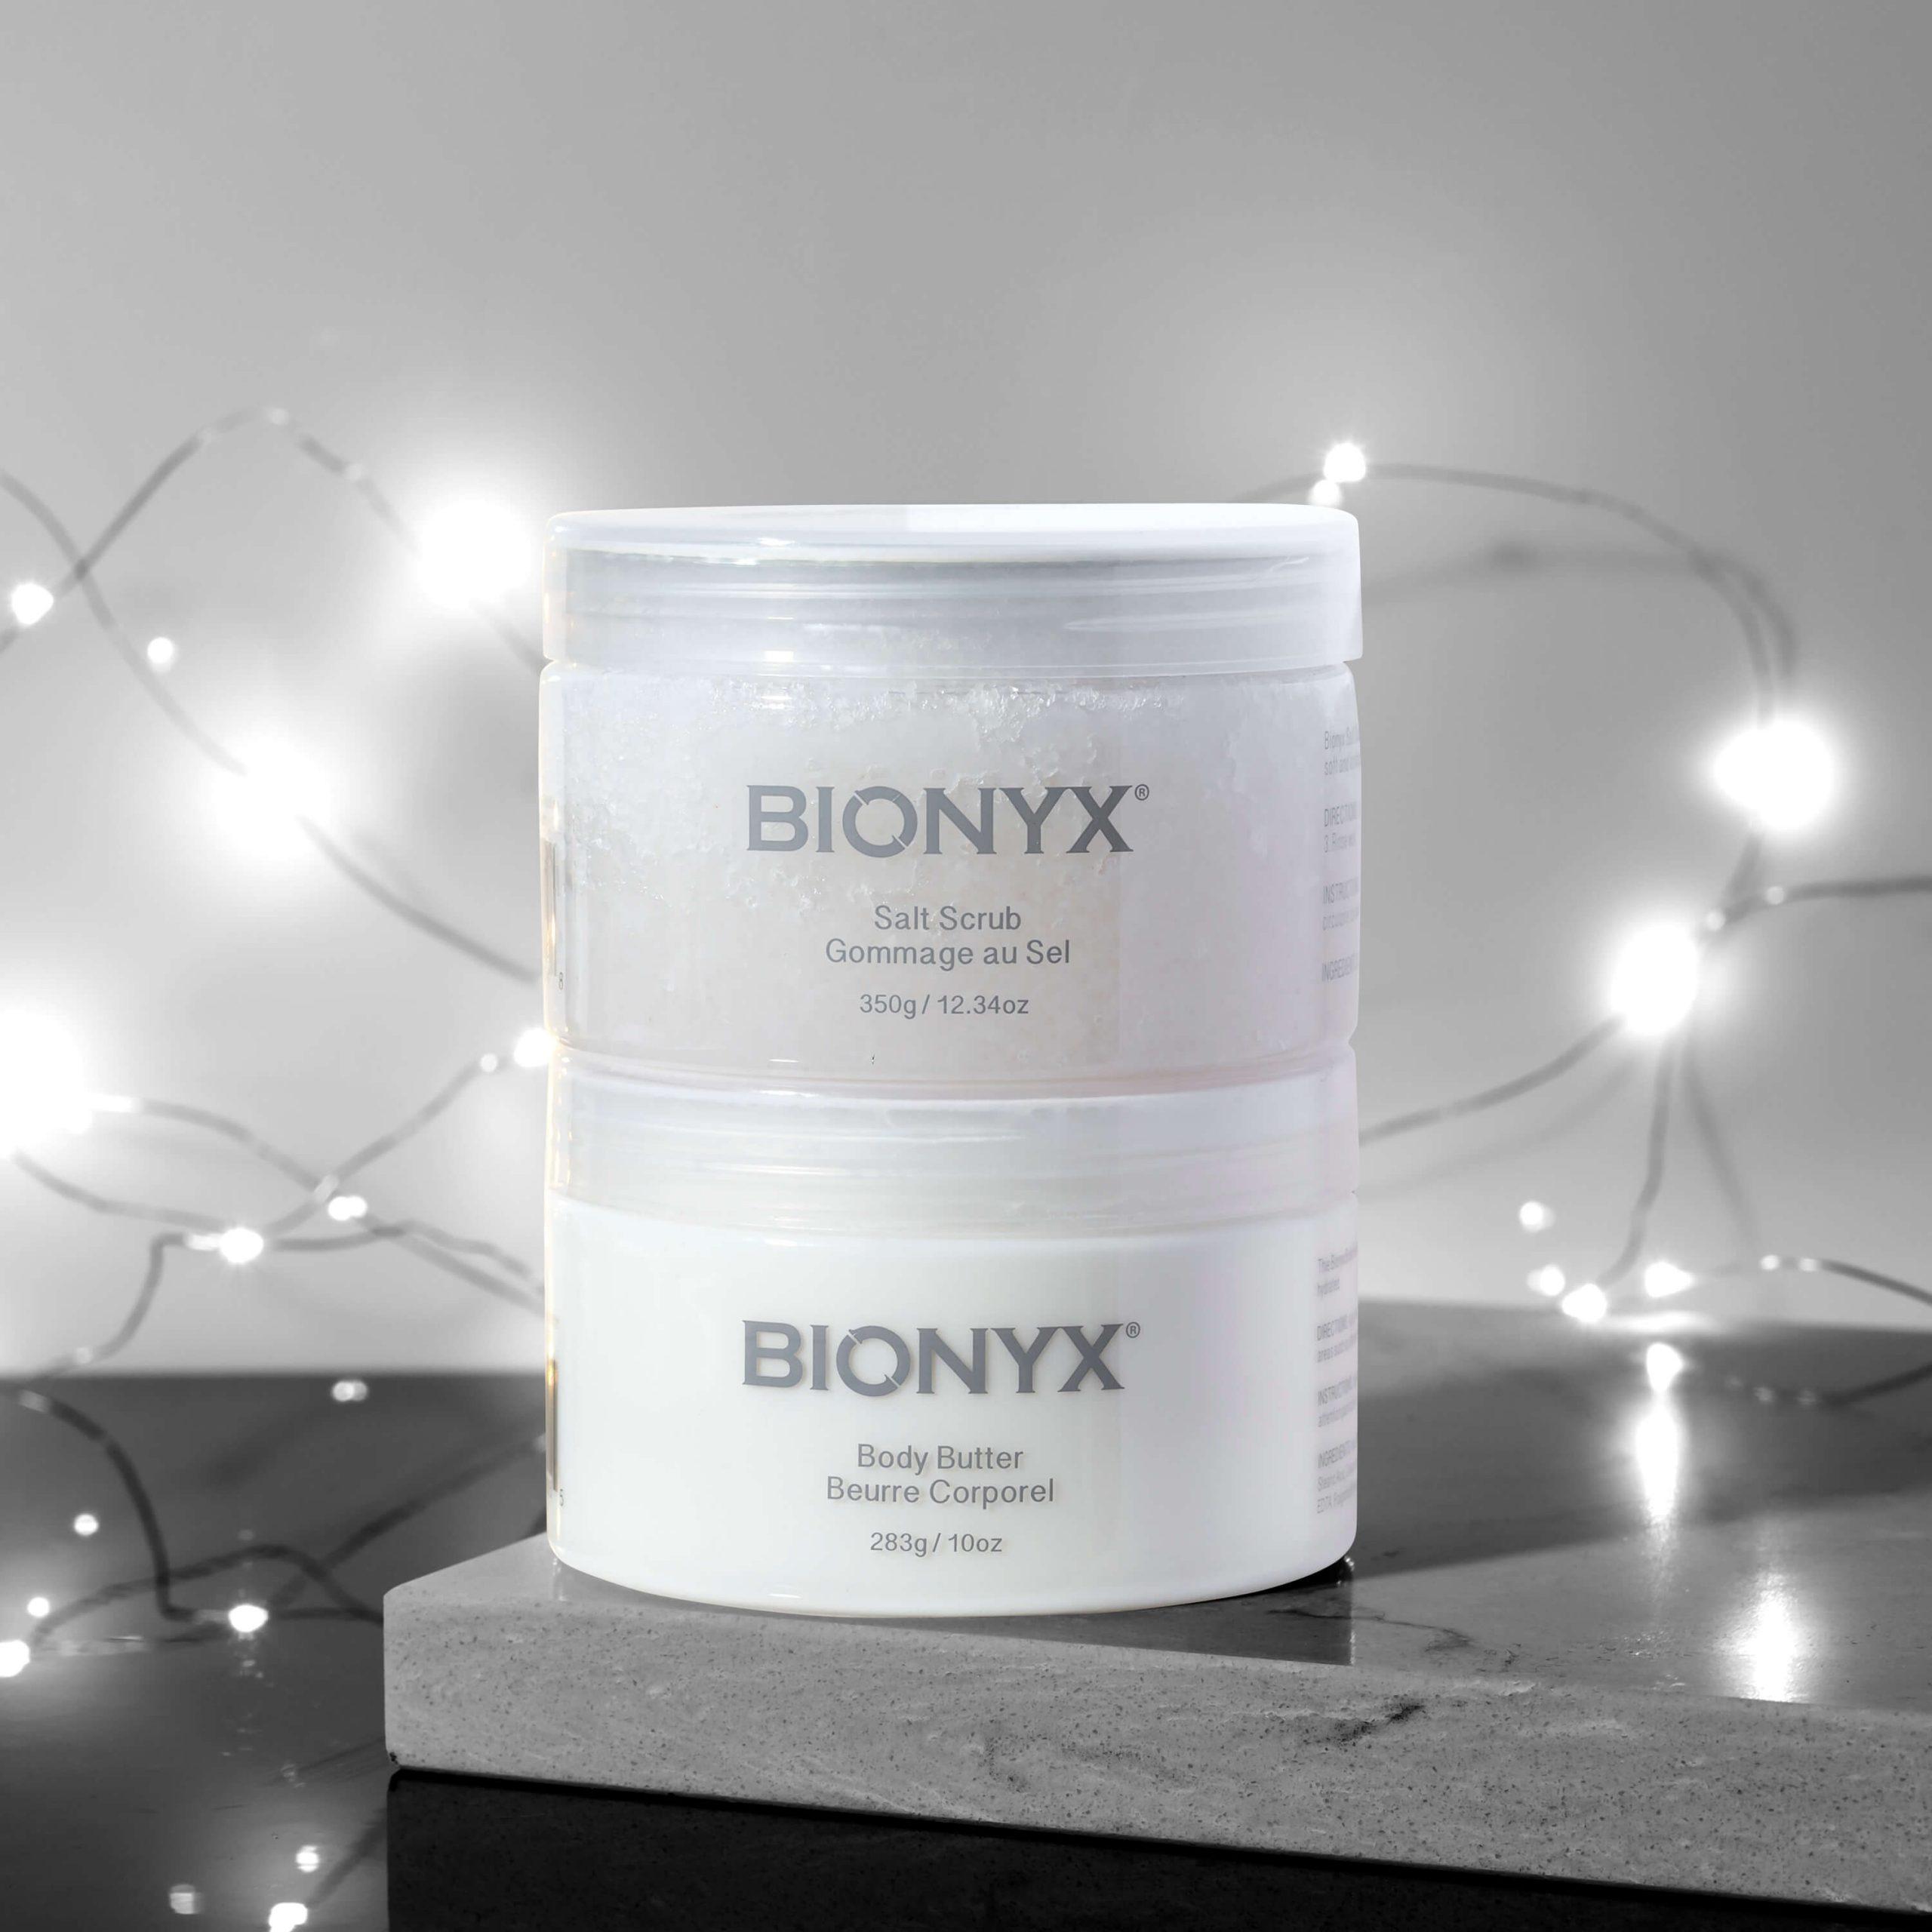 Bionyx Salt Scrub and Body Butter